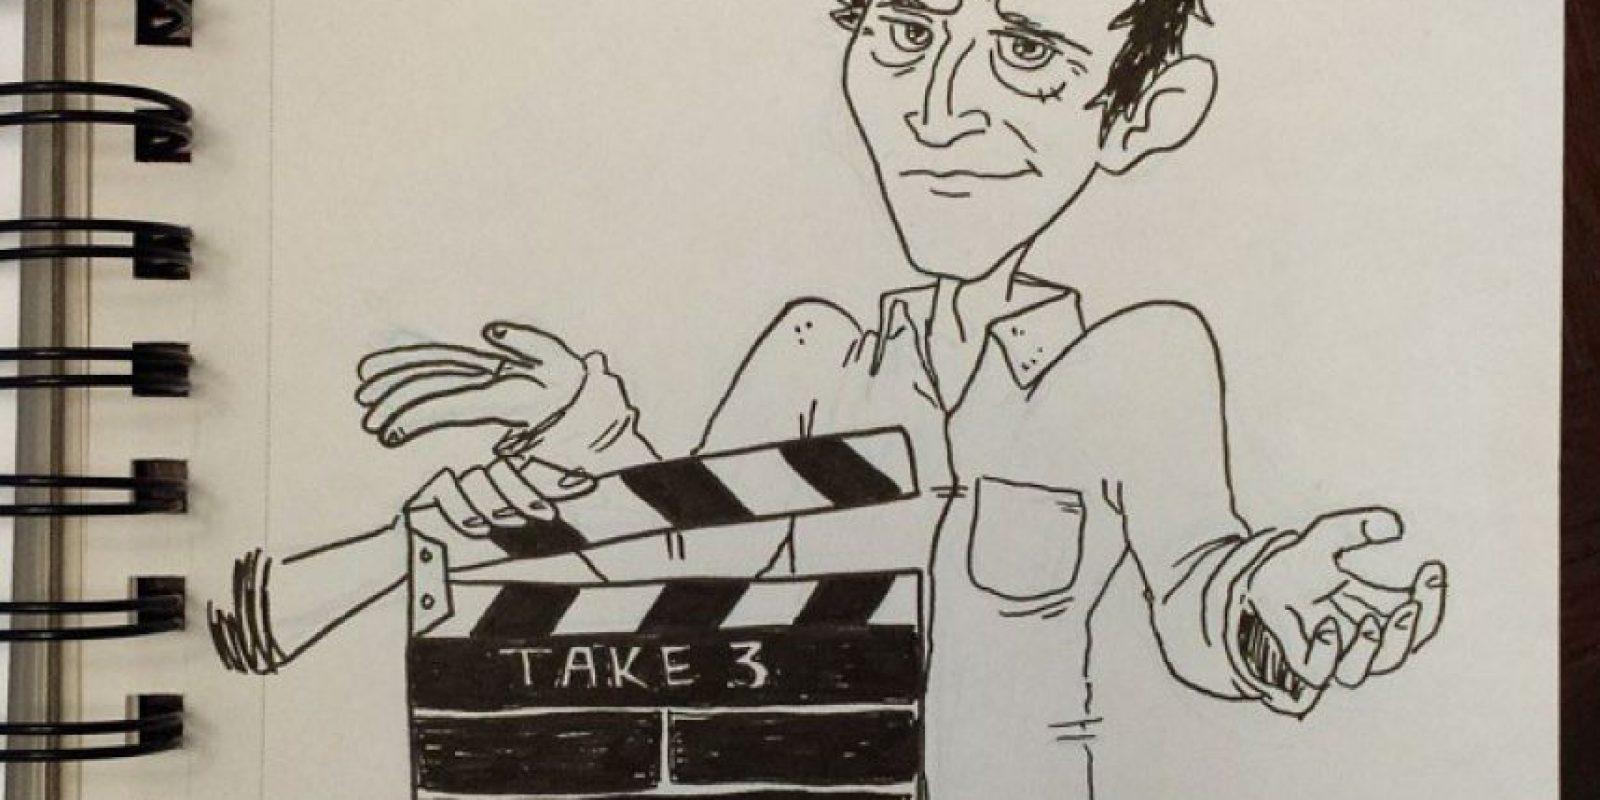 "(La palabra ""taken"" cambia por ""take"", que significa ""toma""): ""Liam Neeson protagoniza esta película inspirada en 'Groundhog Day', que trata sobre un artista que estelariza una serie de películas de acción practicamente idénticas. ¿Cuántas tomas antes de terminar de grabar?"". Foto:AustinDLight vía Imgur"